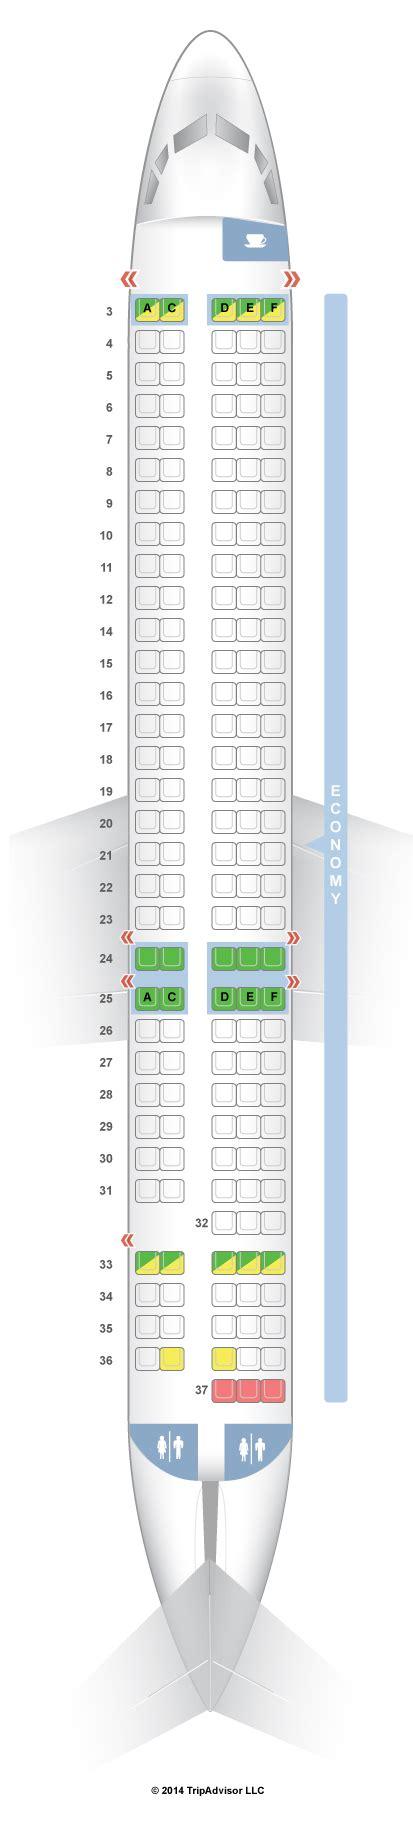 seatguru seat map allegiant mcdonnell douglas md